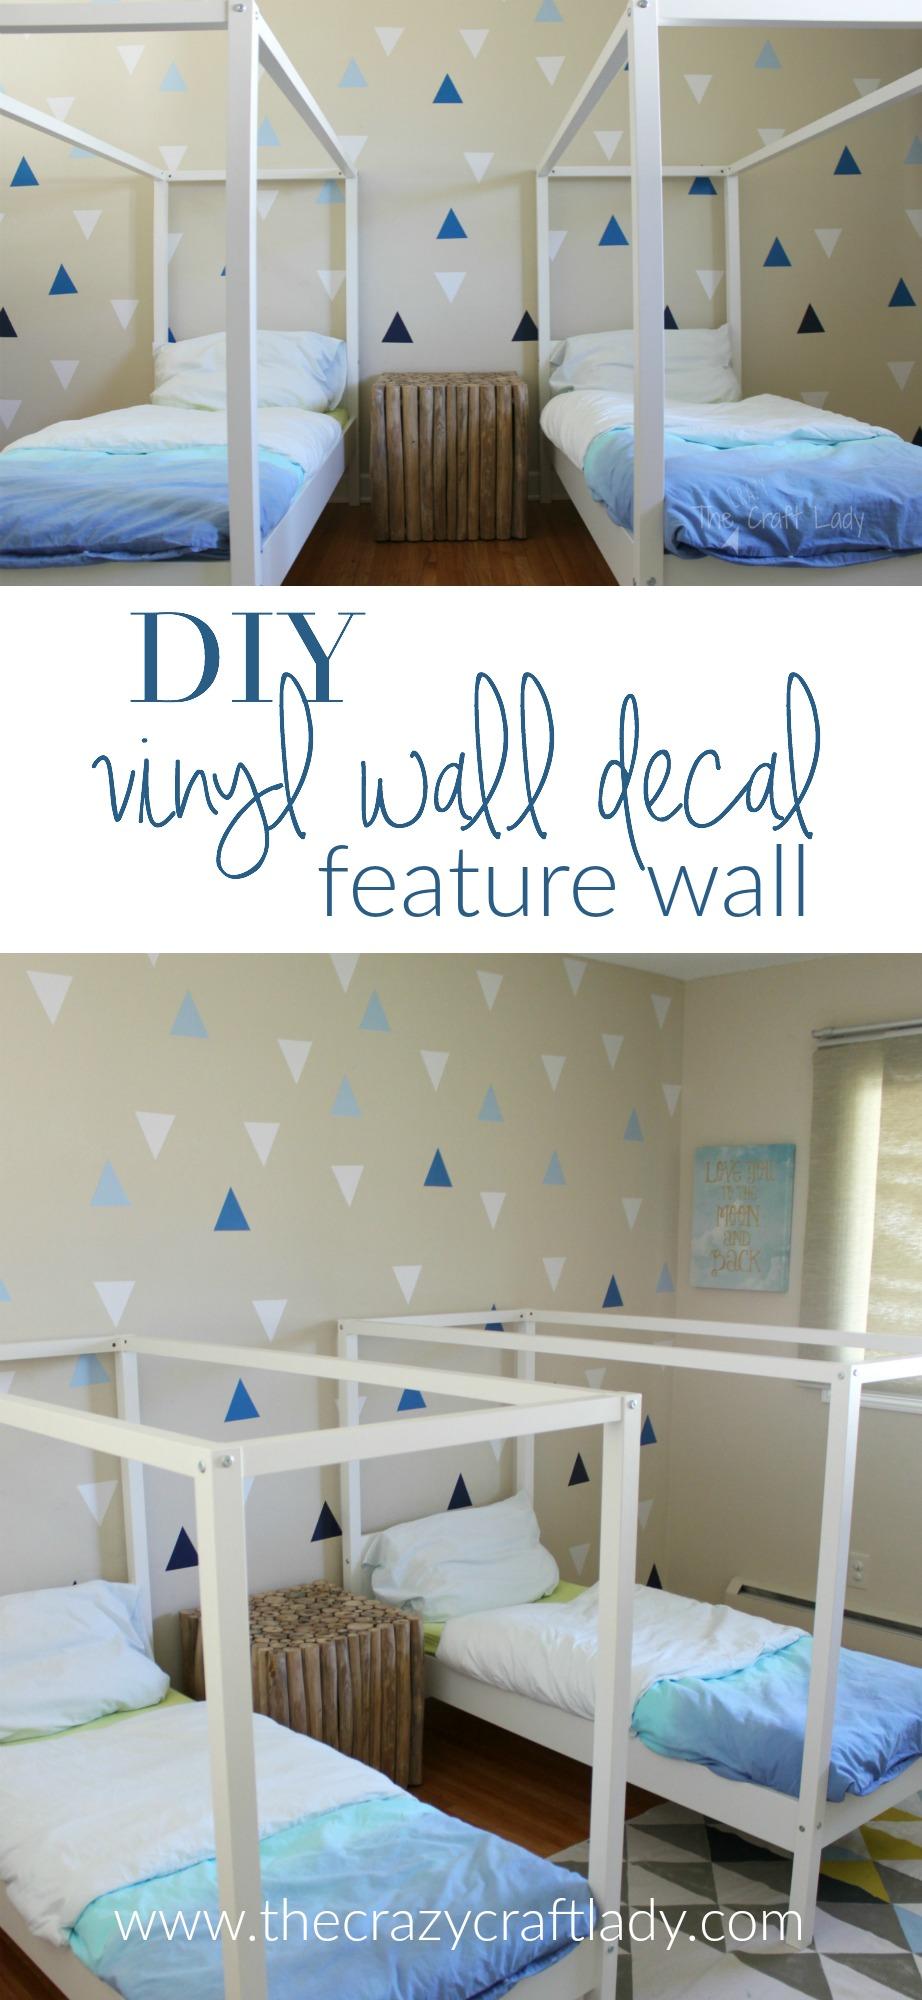 diy rental diy wall decals rental friendly decor a feature wall the craft